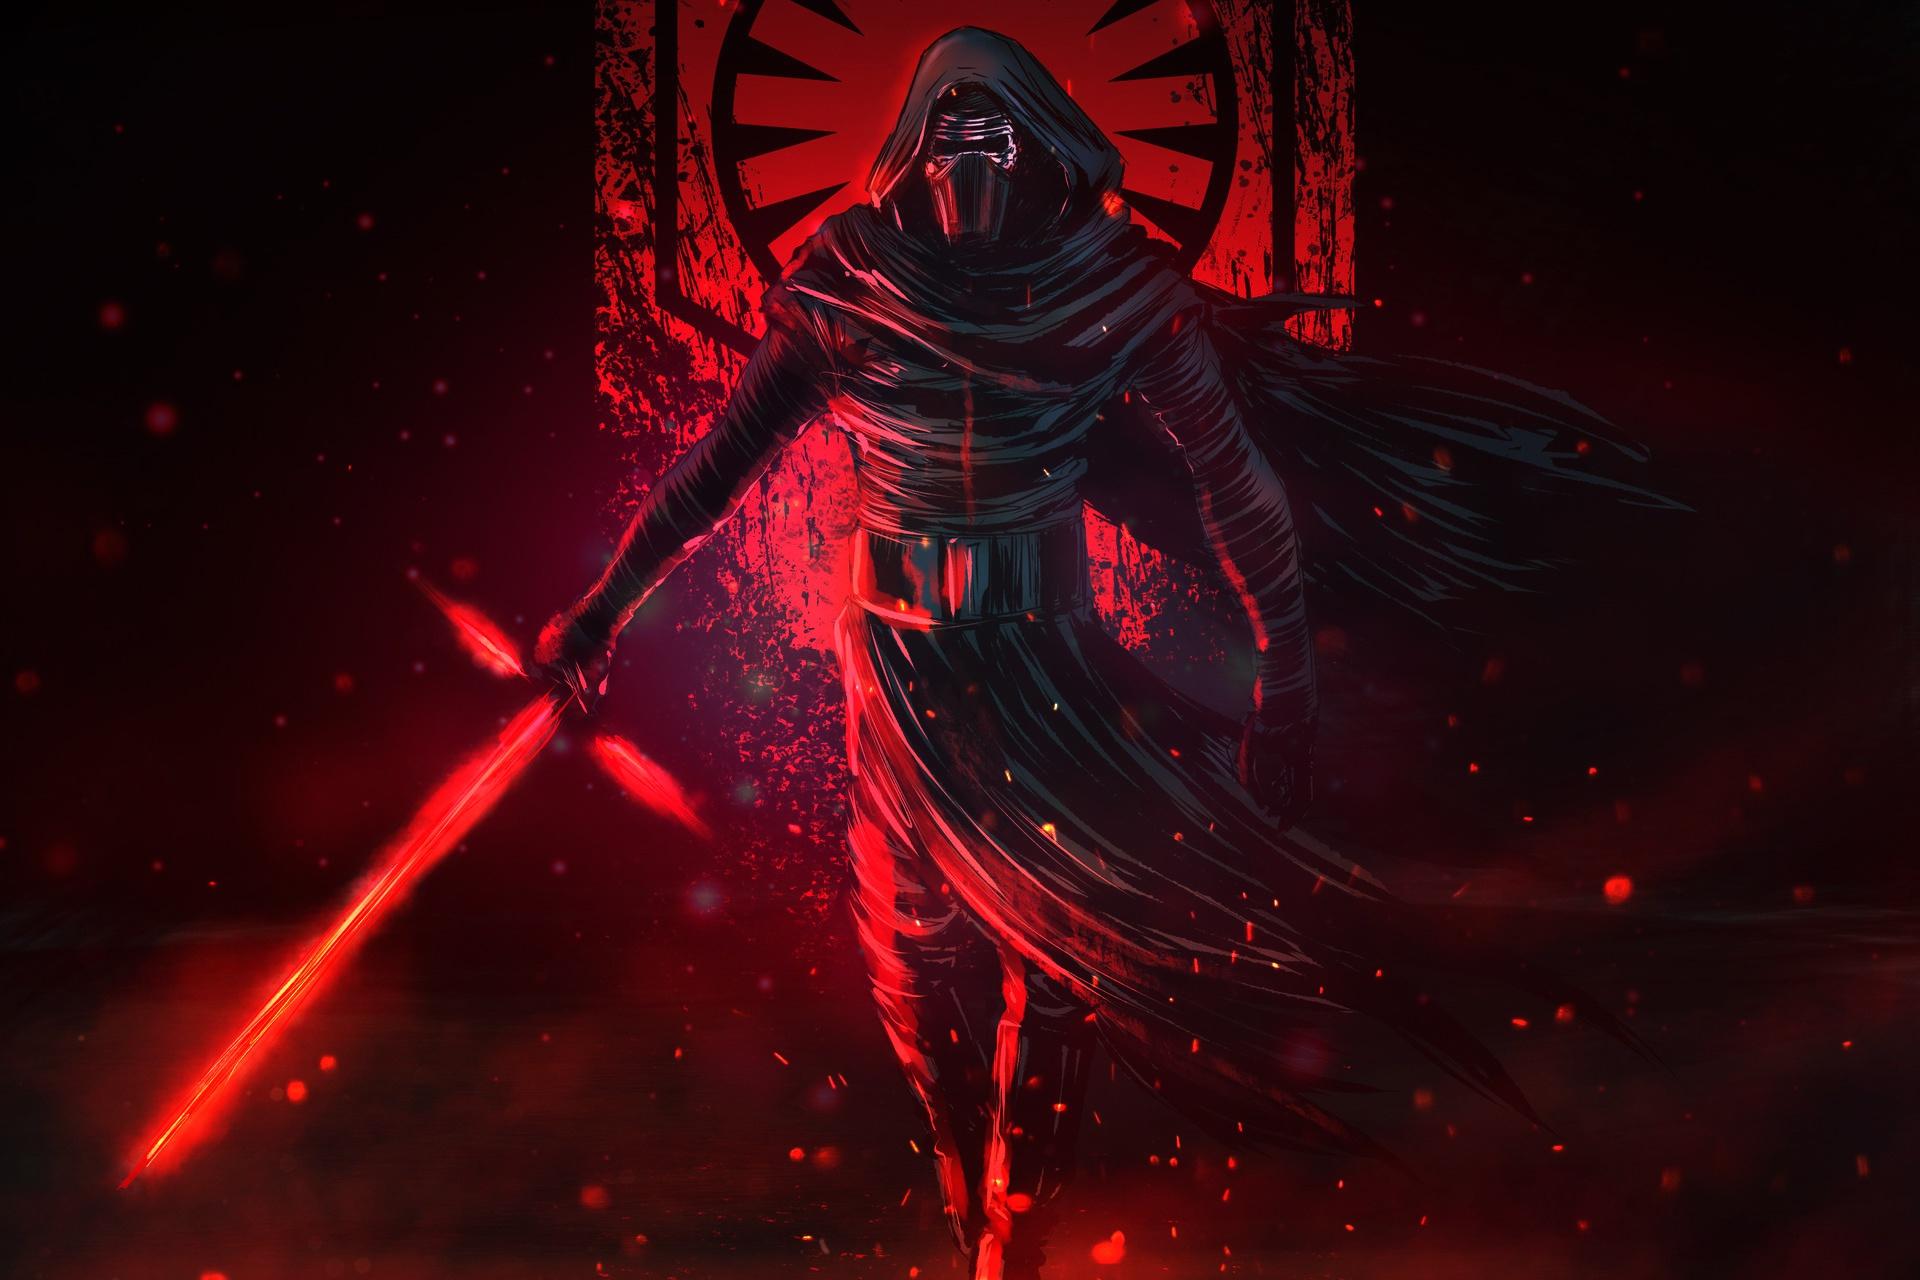 Star Wars, Lightsaber, Kylo Ren Wallpaper And Background